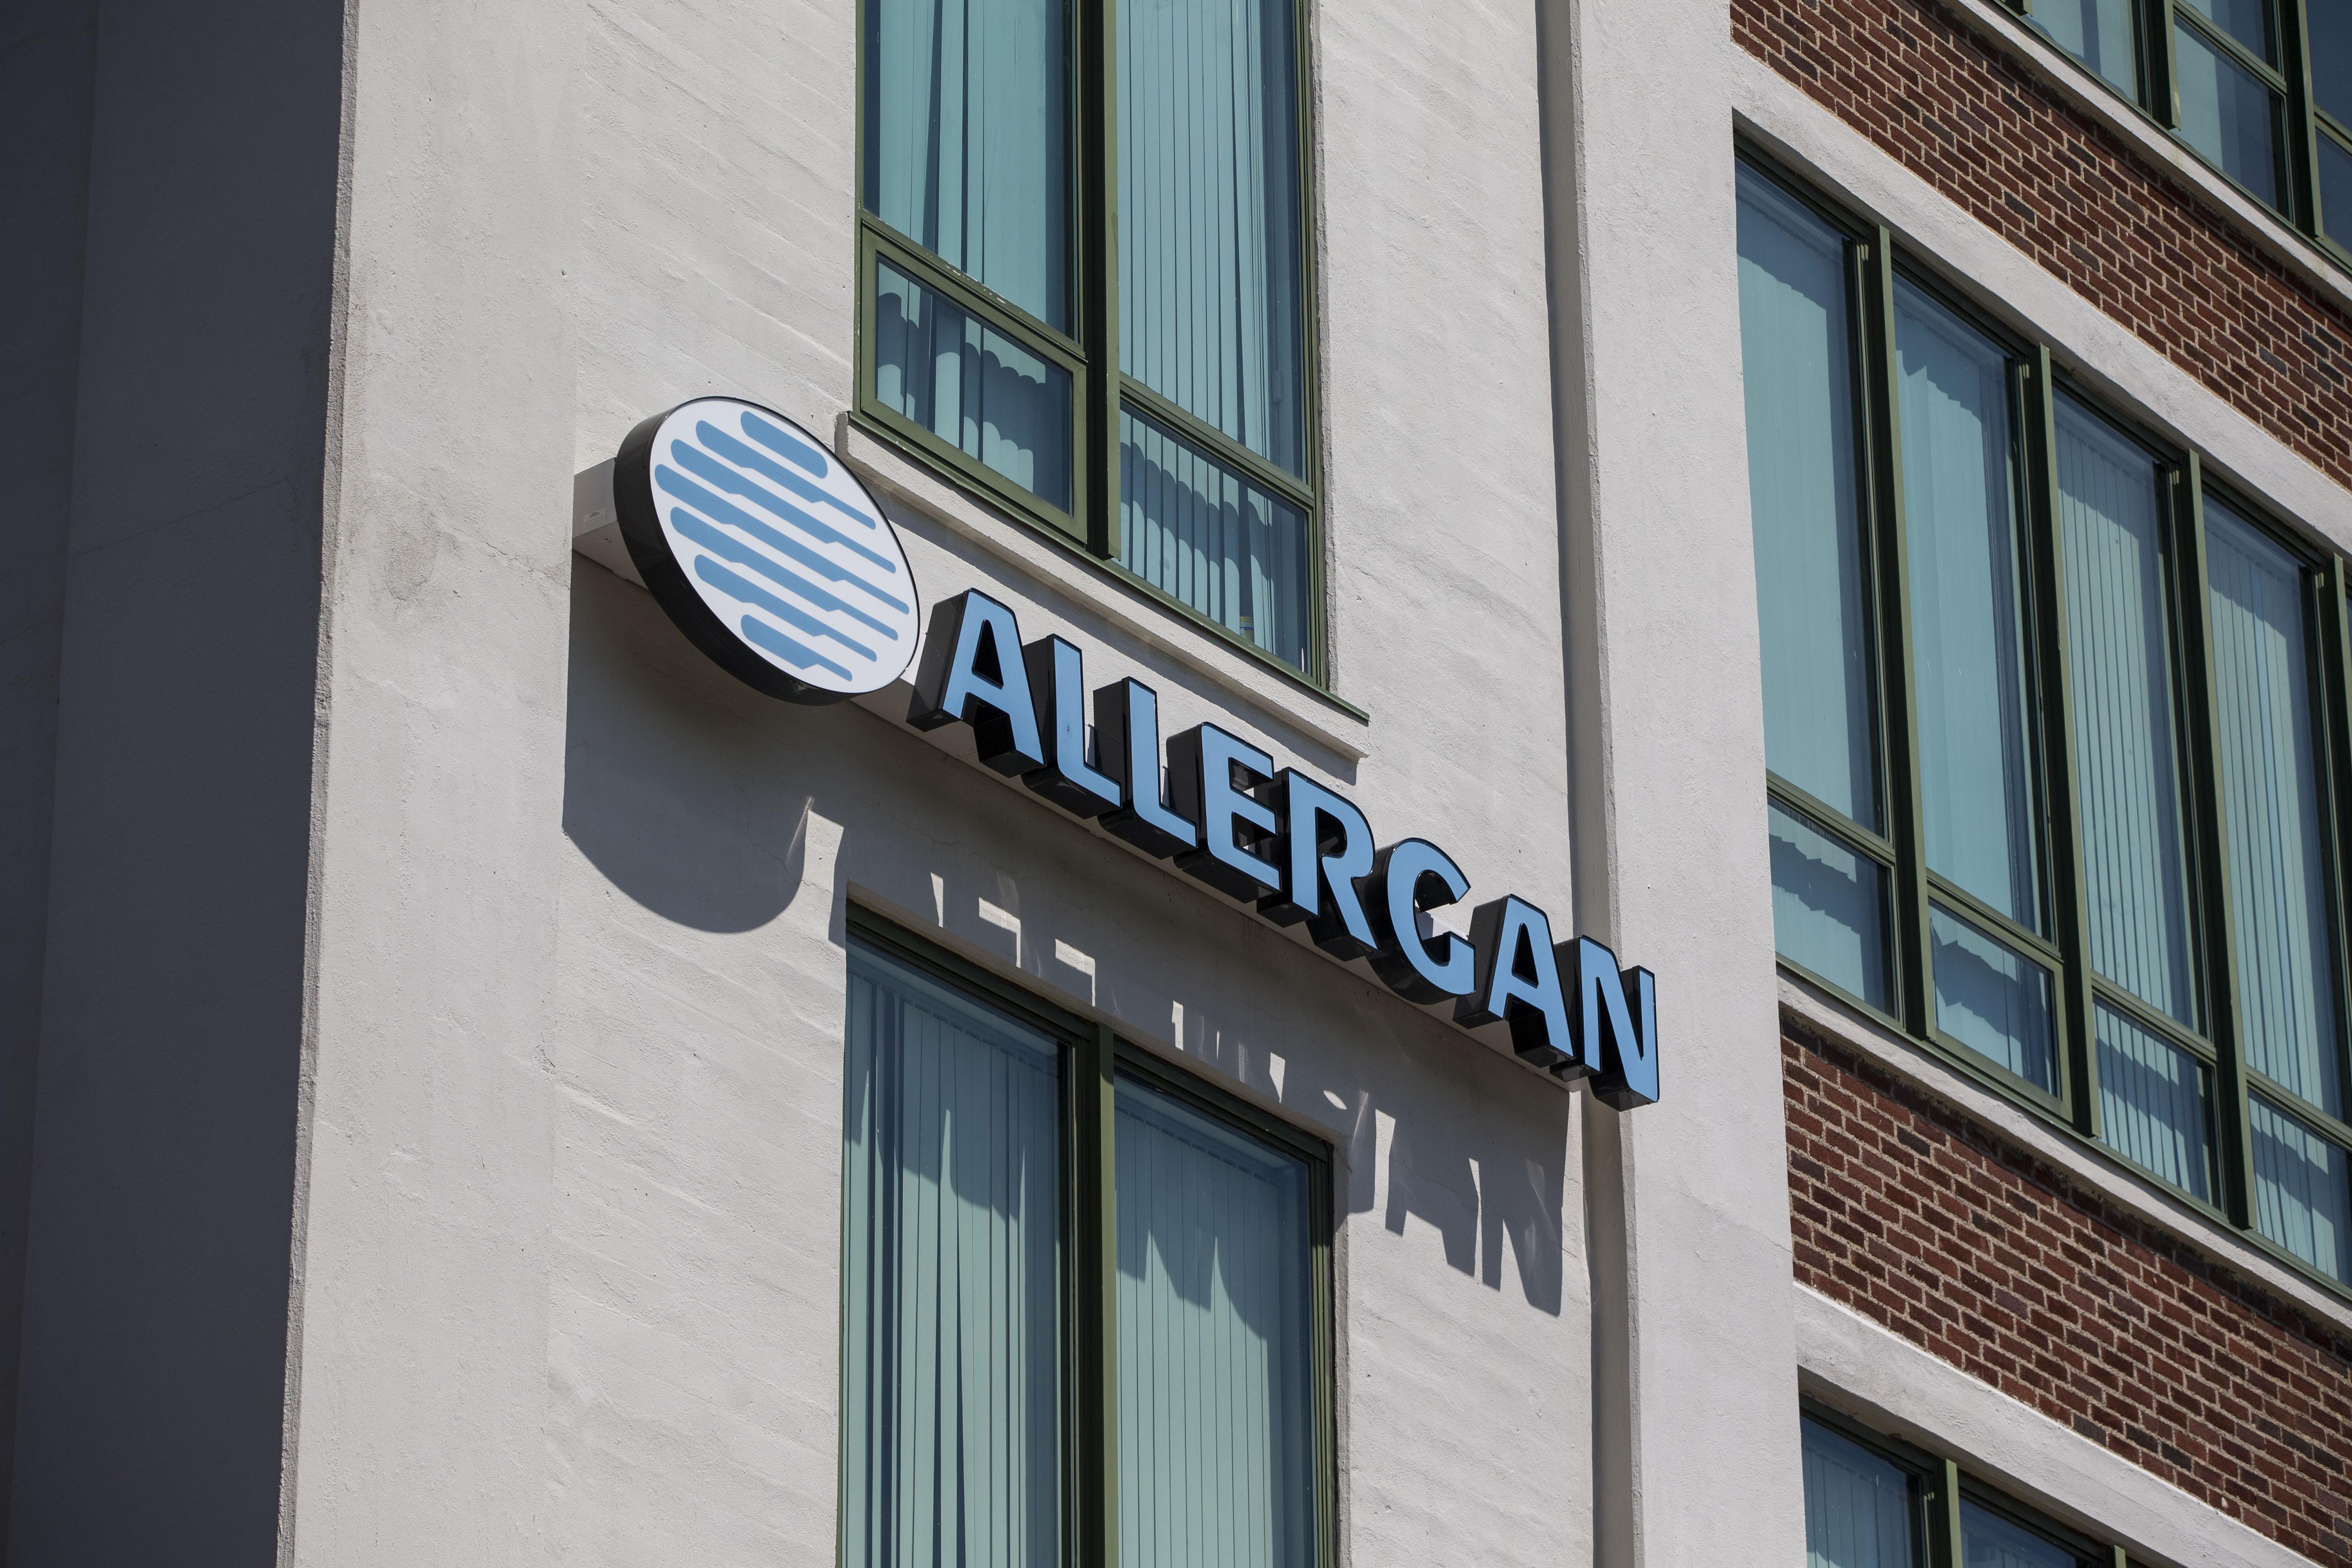 Allergan Plc Offices Ahead Of Earnings Figure